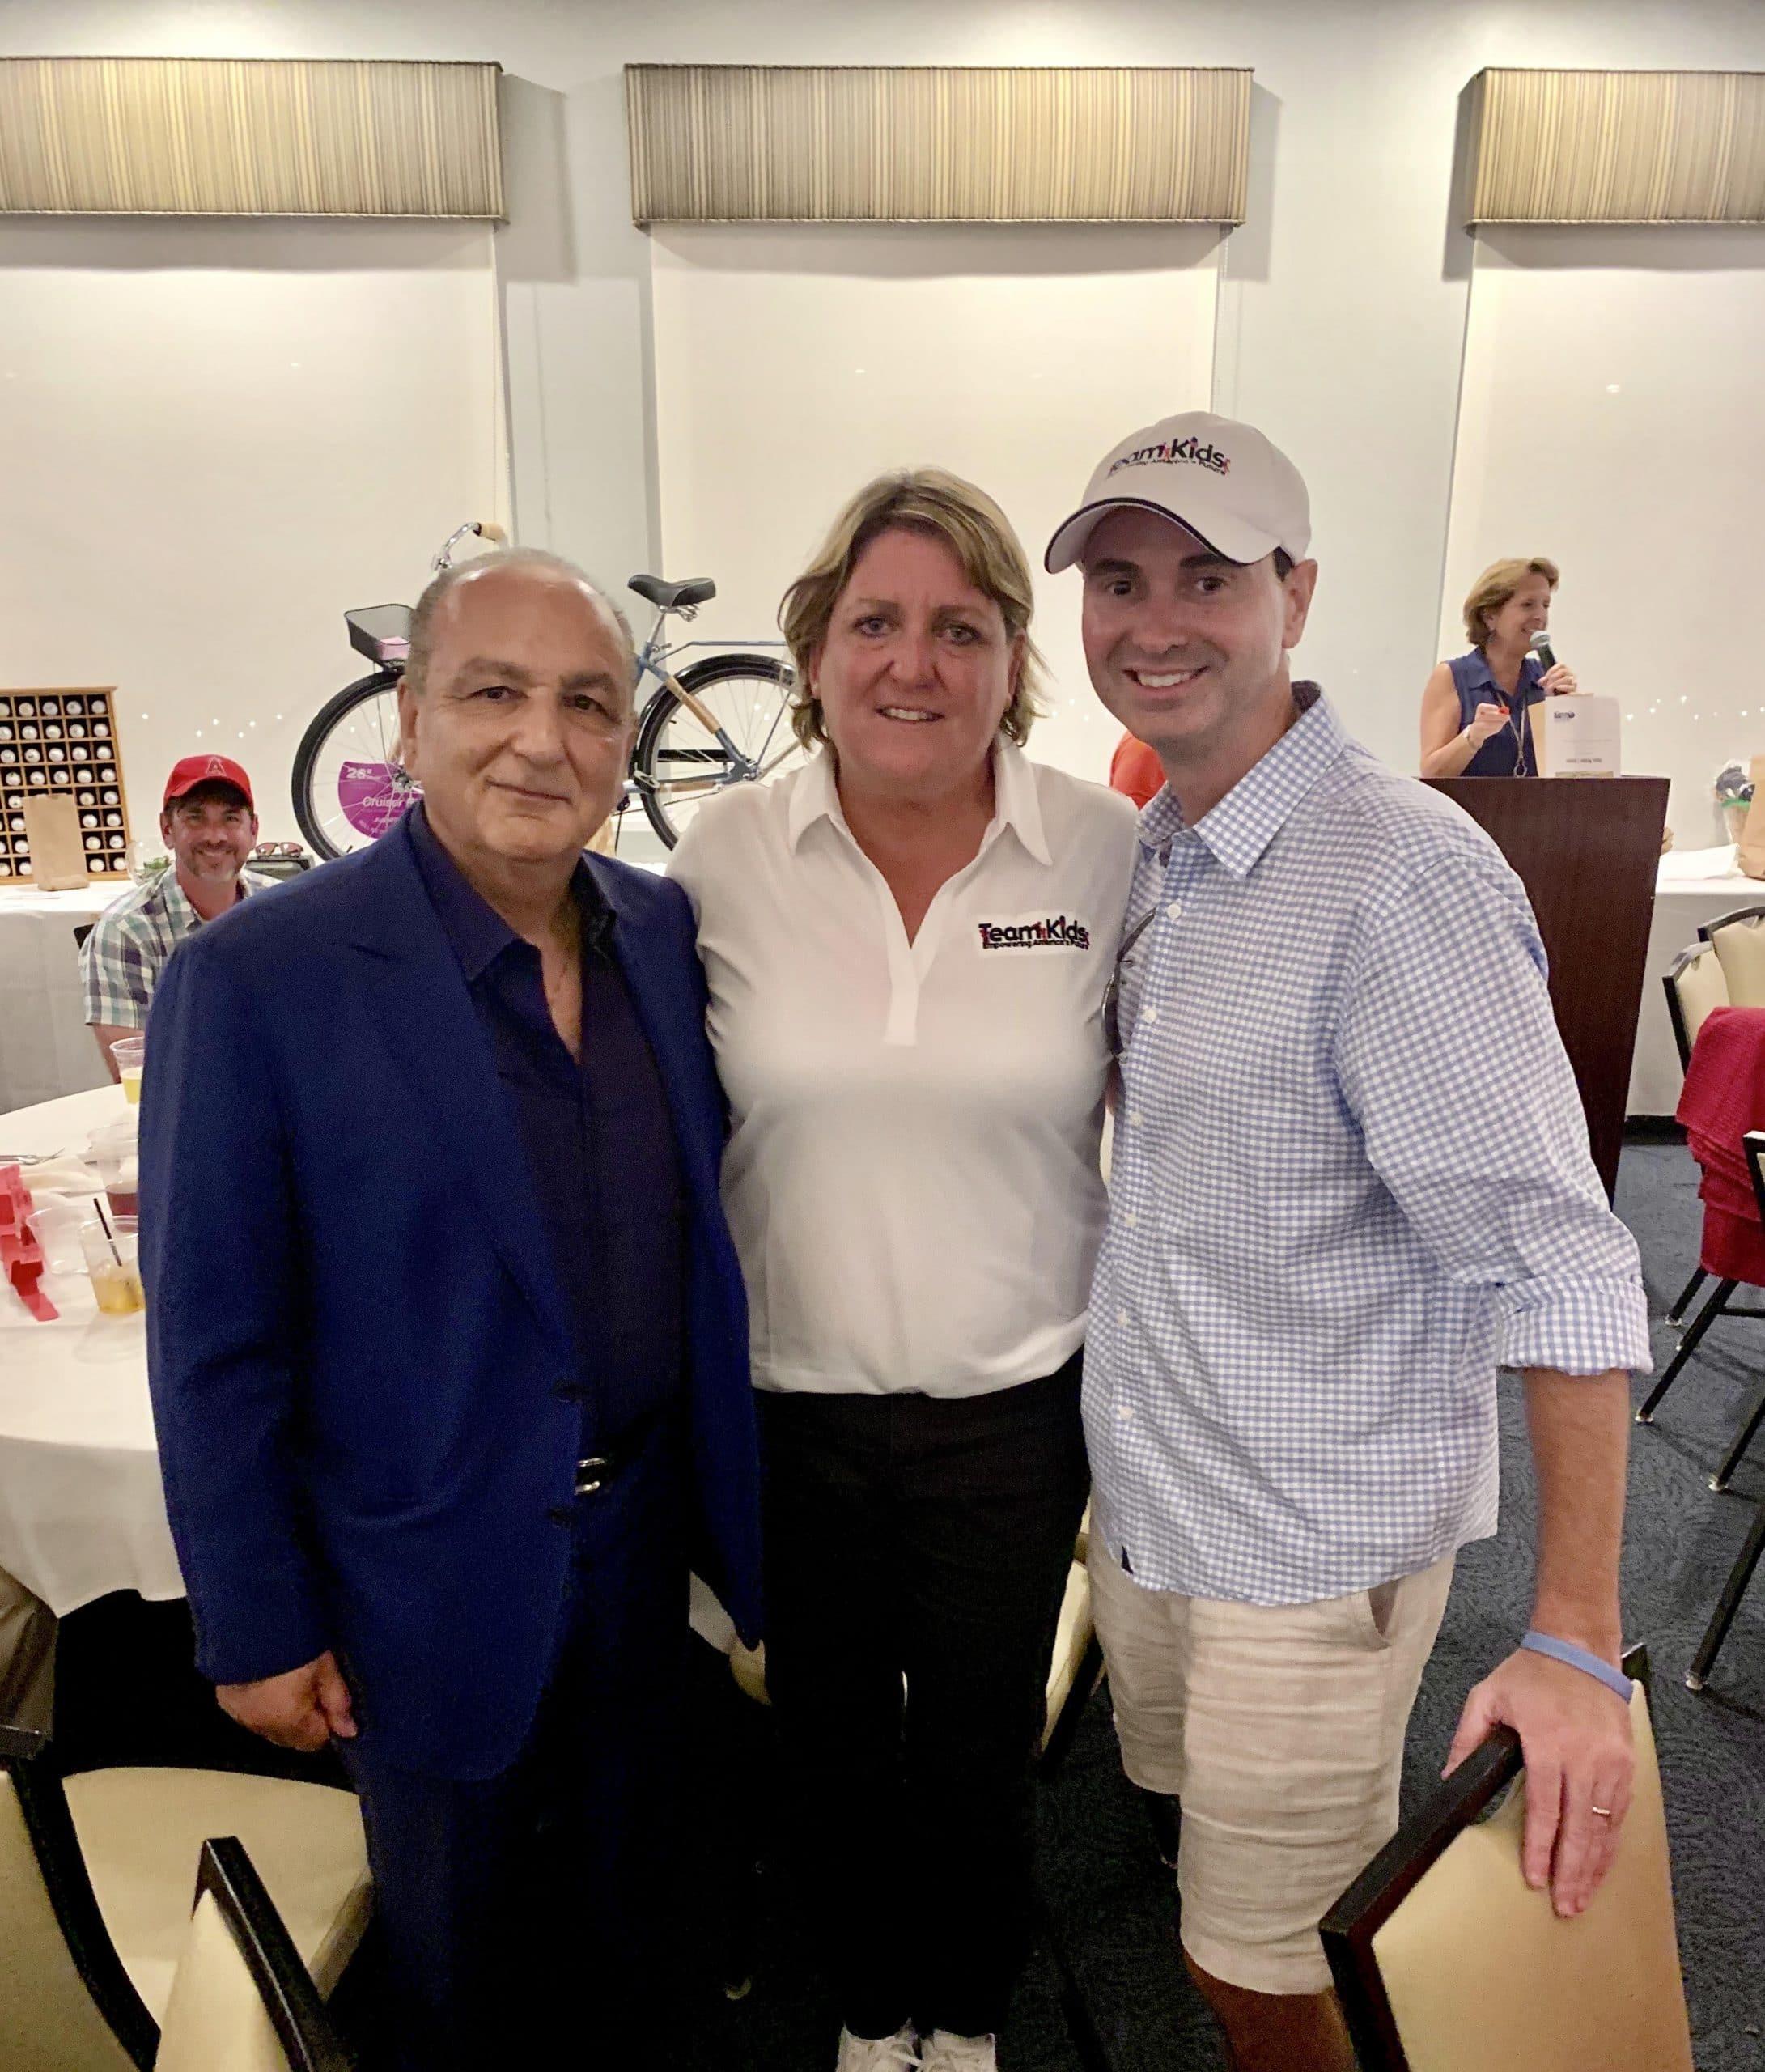 Cameron Merage, Julie Hudash, and Charles Glorioso at the Superhero Golf Classic